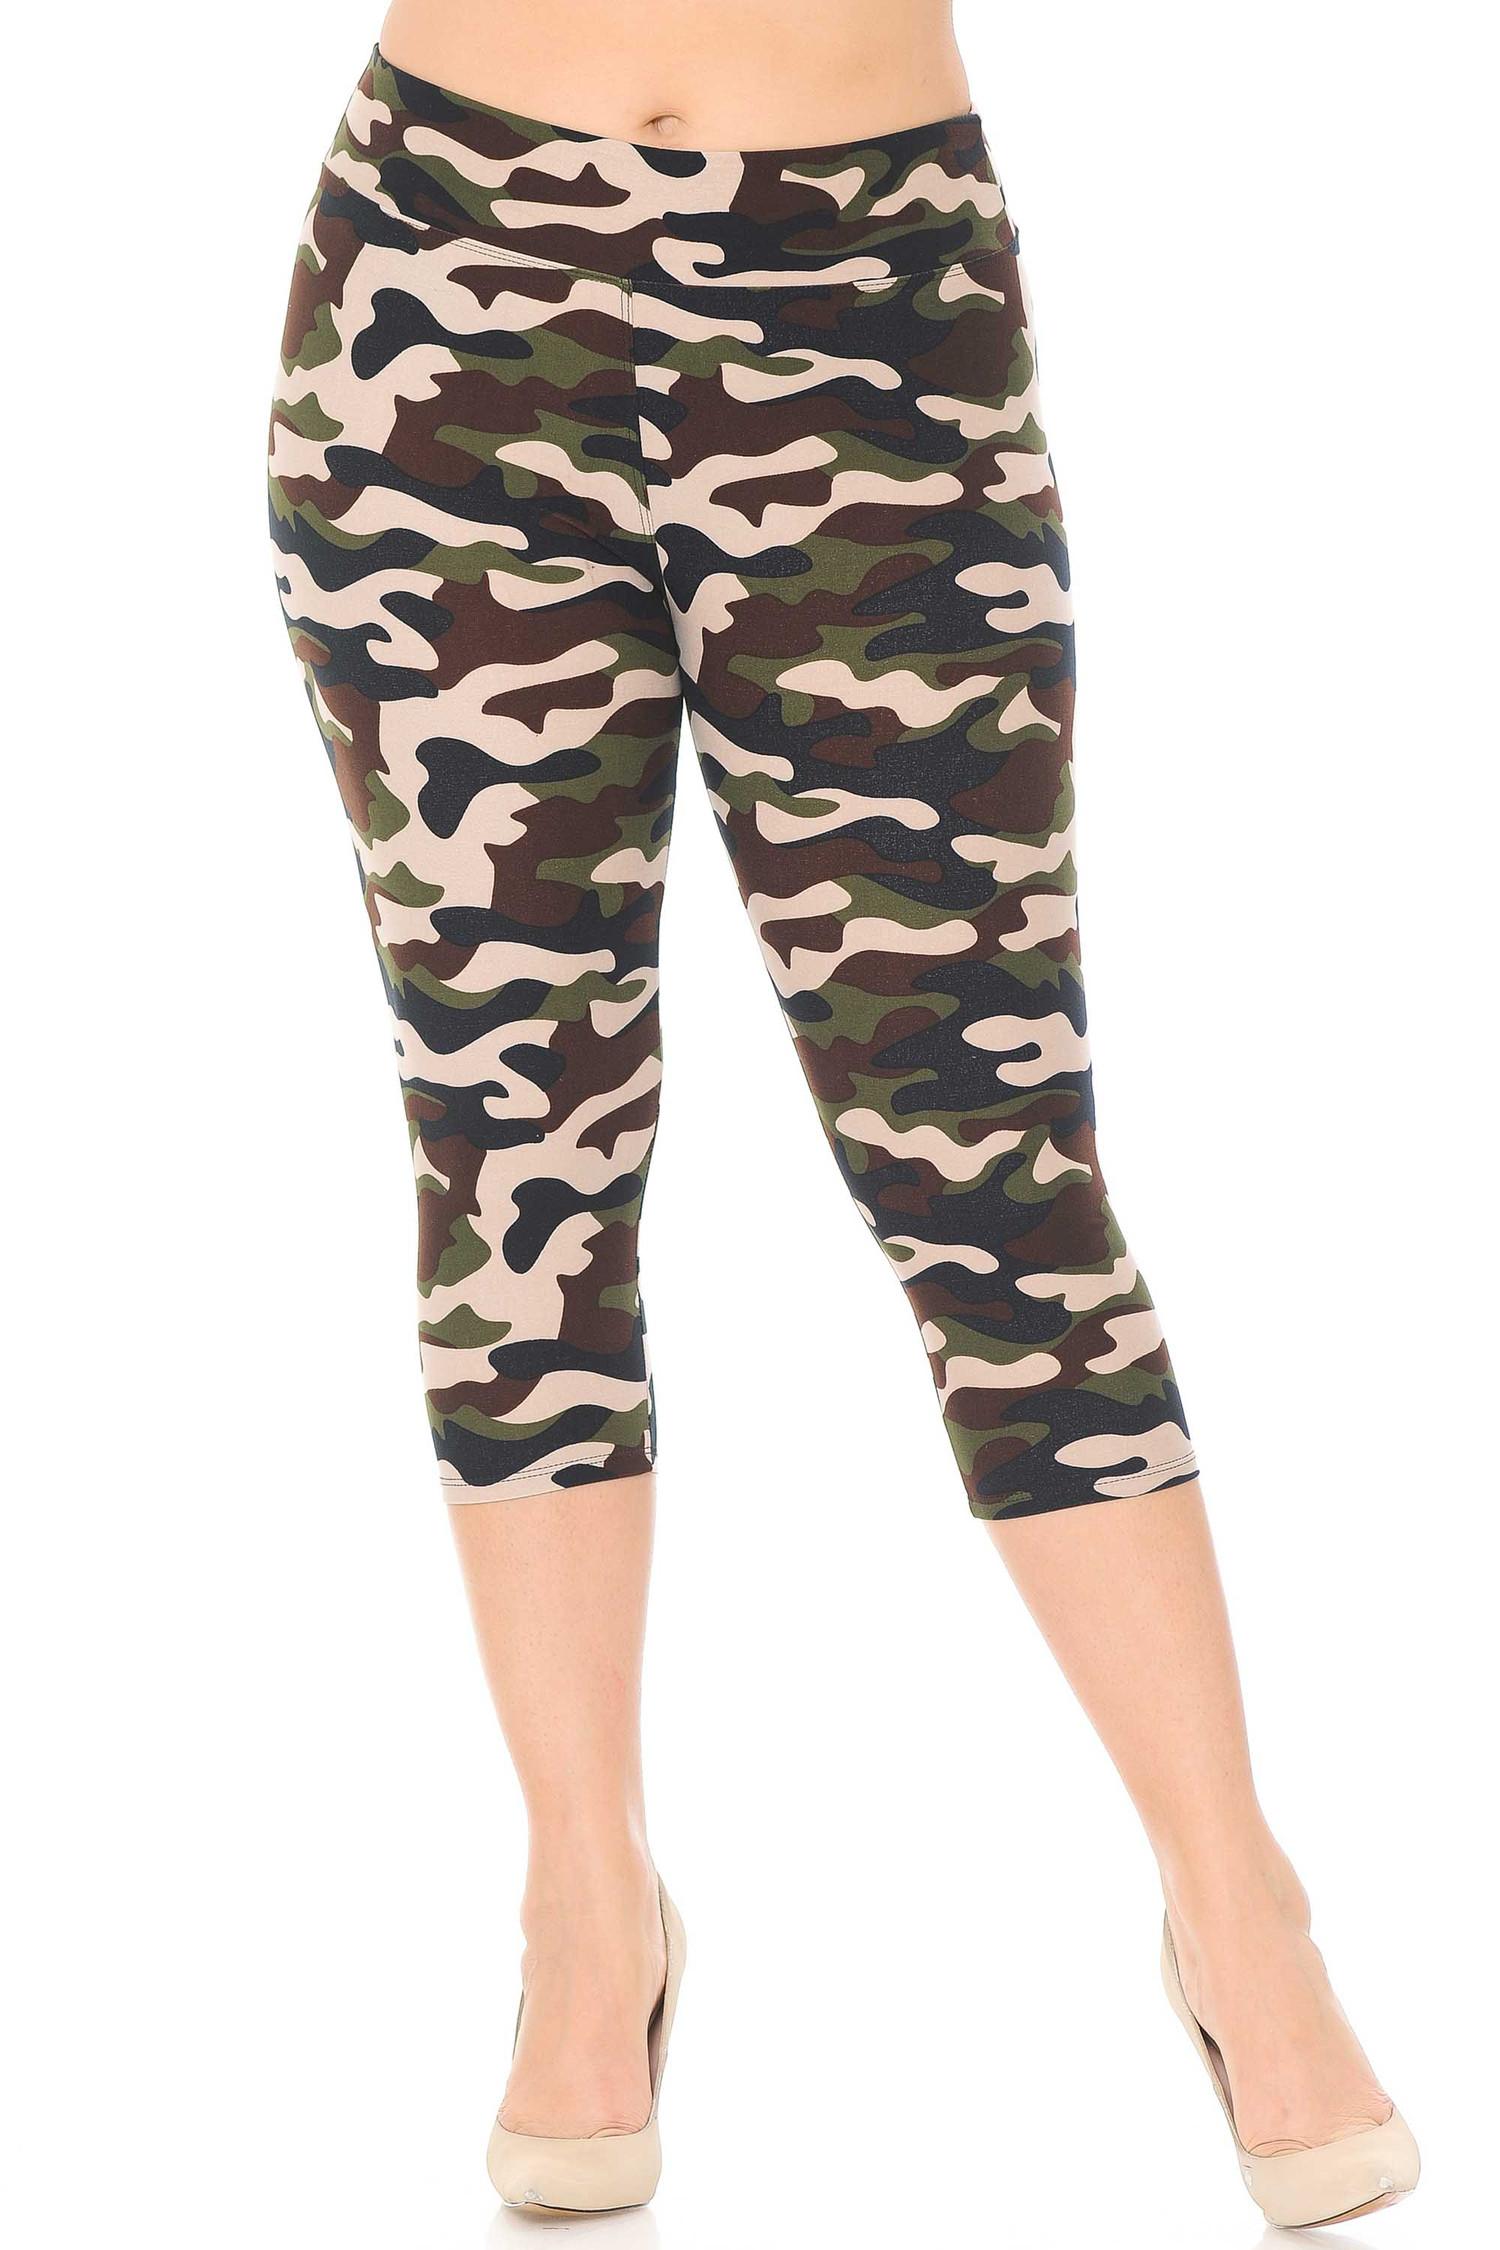 Brushed  Flirty Camouflage High Waist Plus Size Capris - 3  Inch